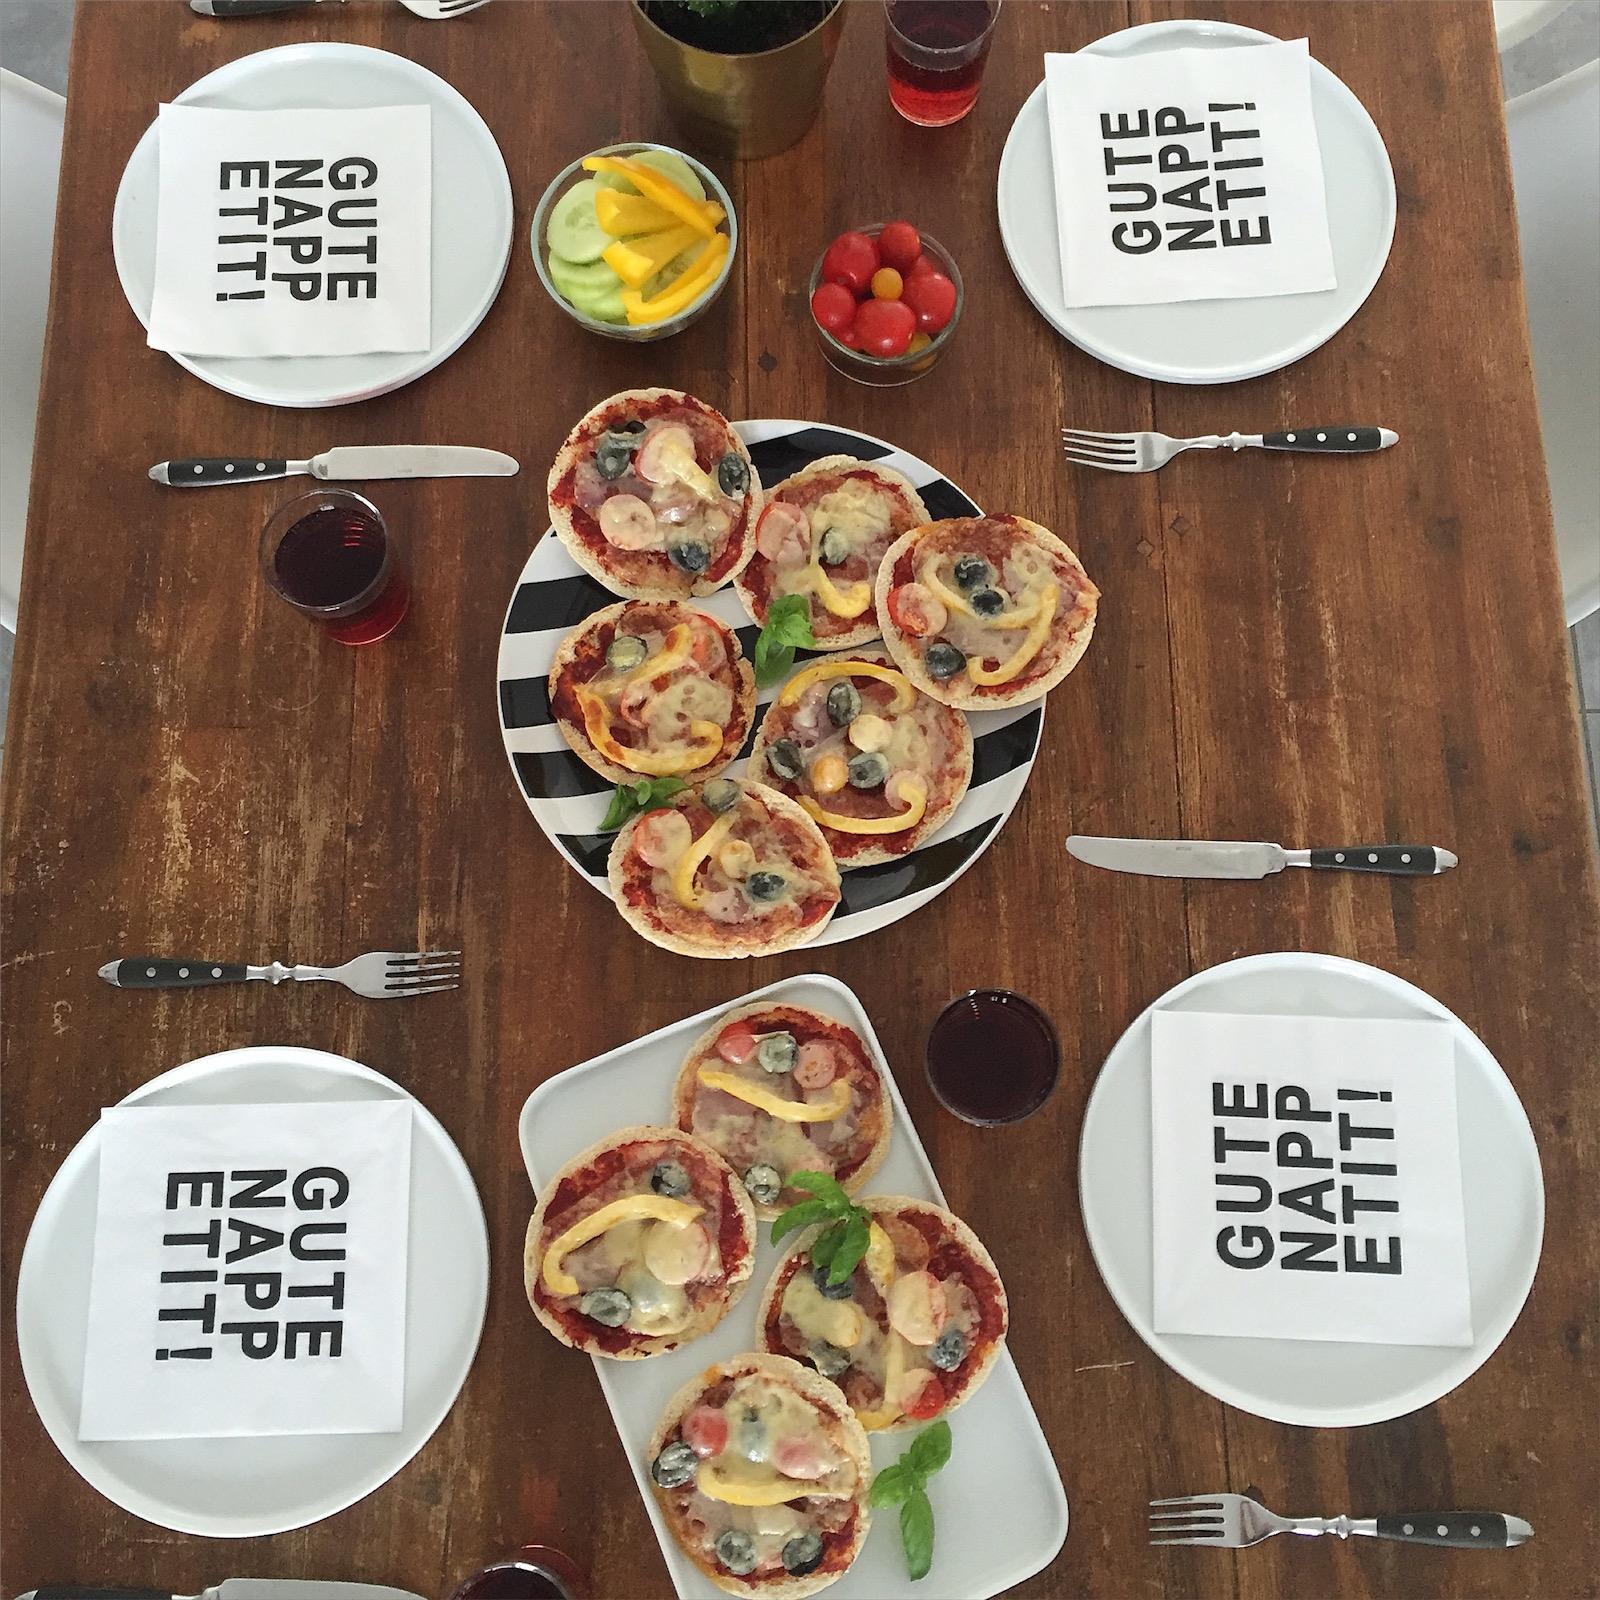 Fol Epi Hauchfein Pita Pizza sophiagaleria